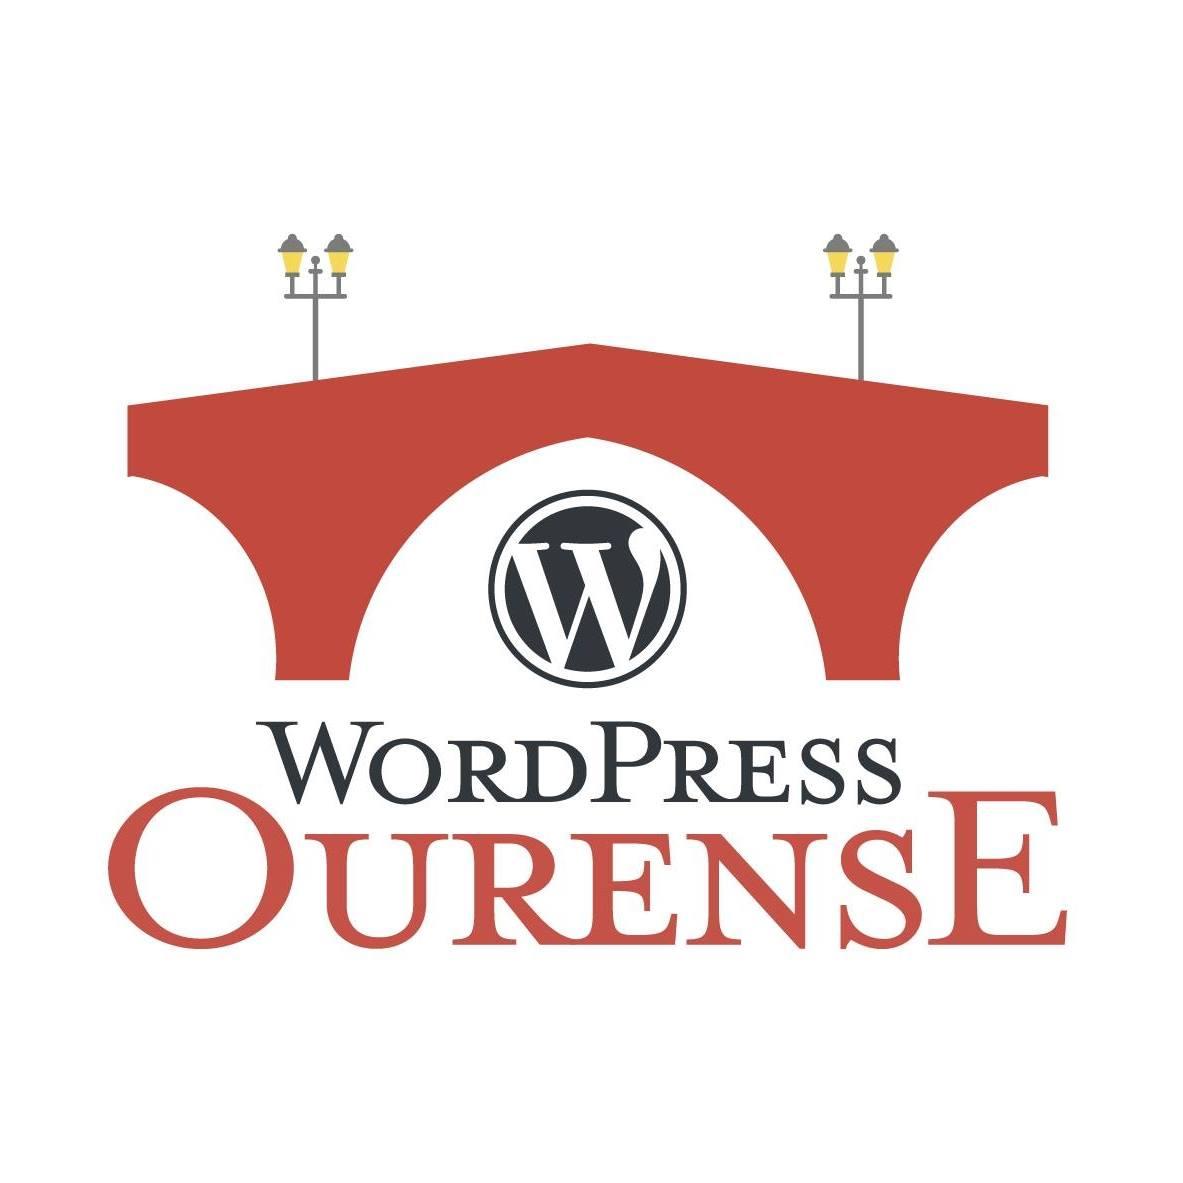 WordPress Ourense